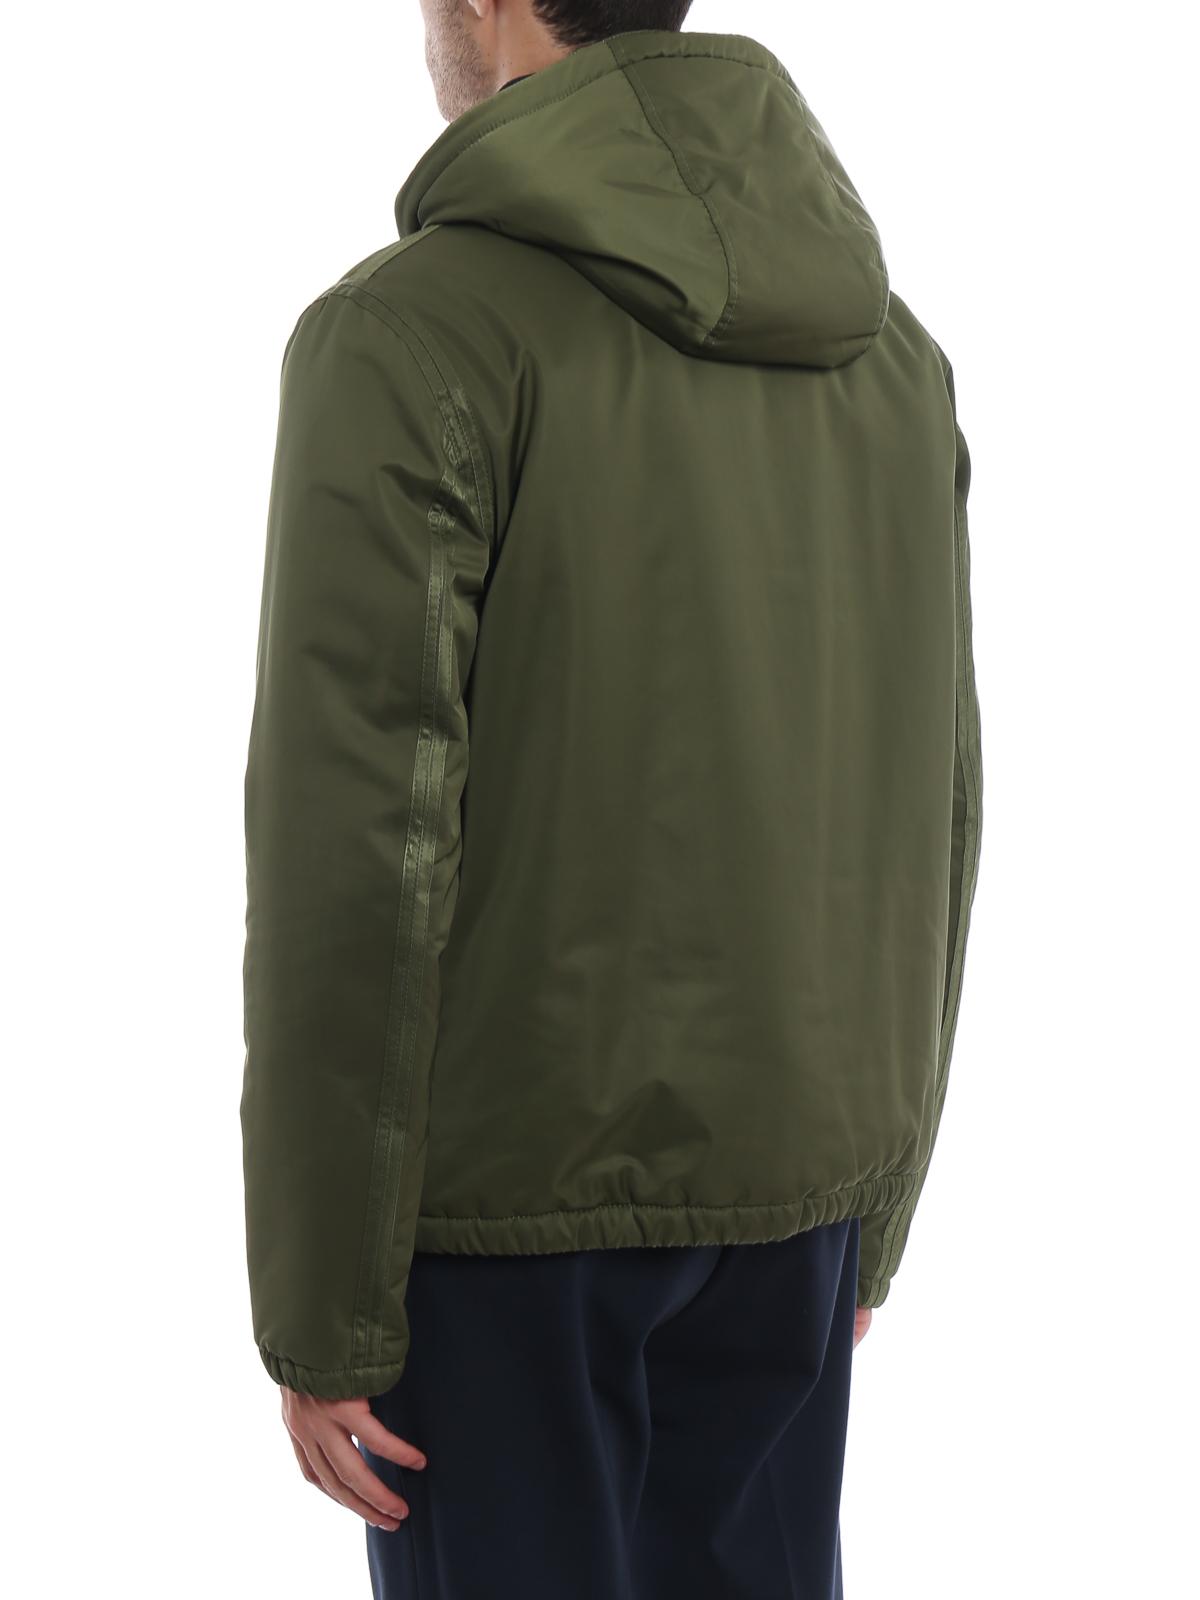 online store 74c57 a5db8 Dondup - Giacca a vento con cappuccio imbottita - giacche ...